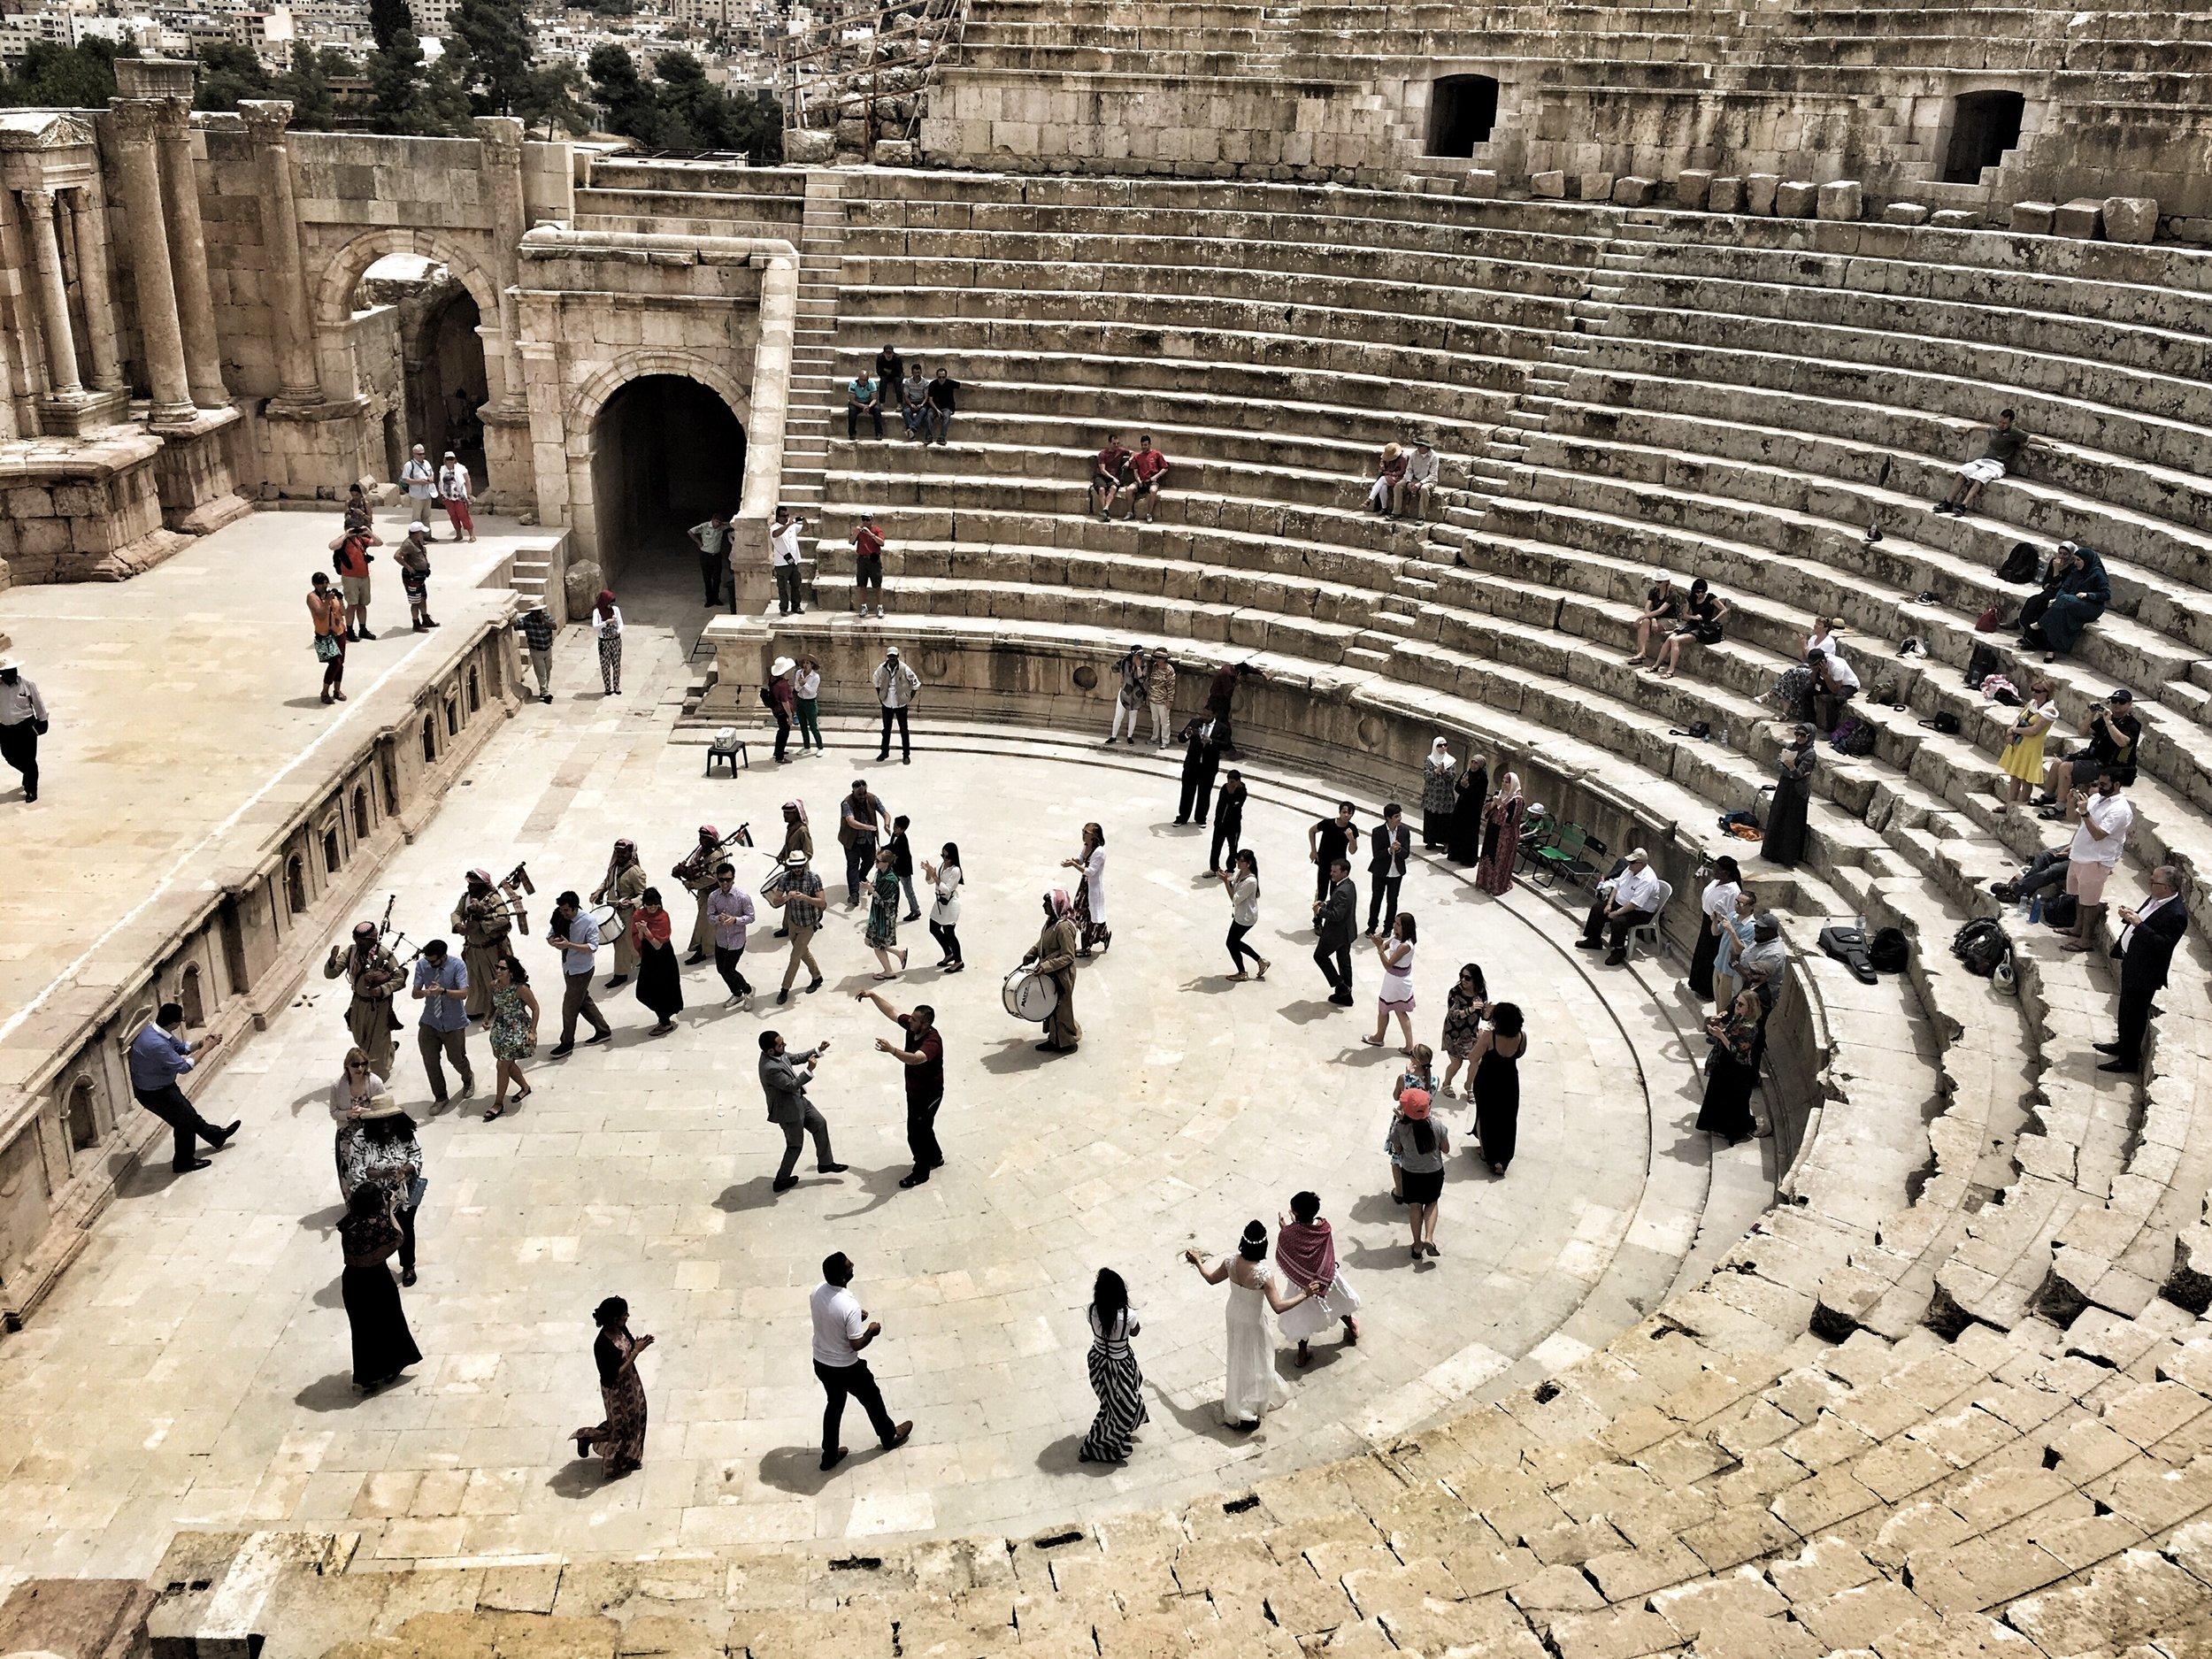 dancing in a circle.jpg